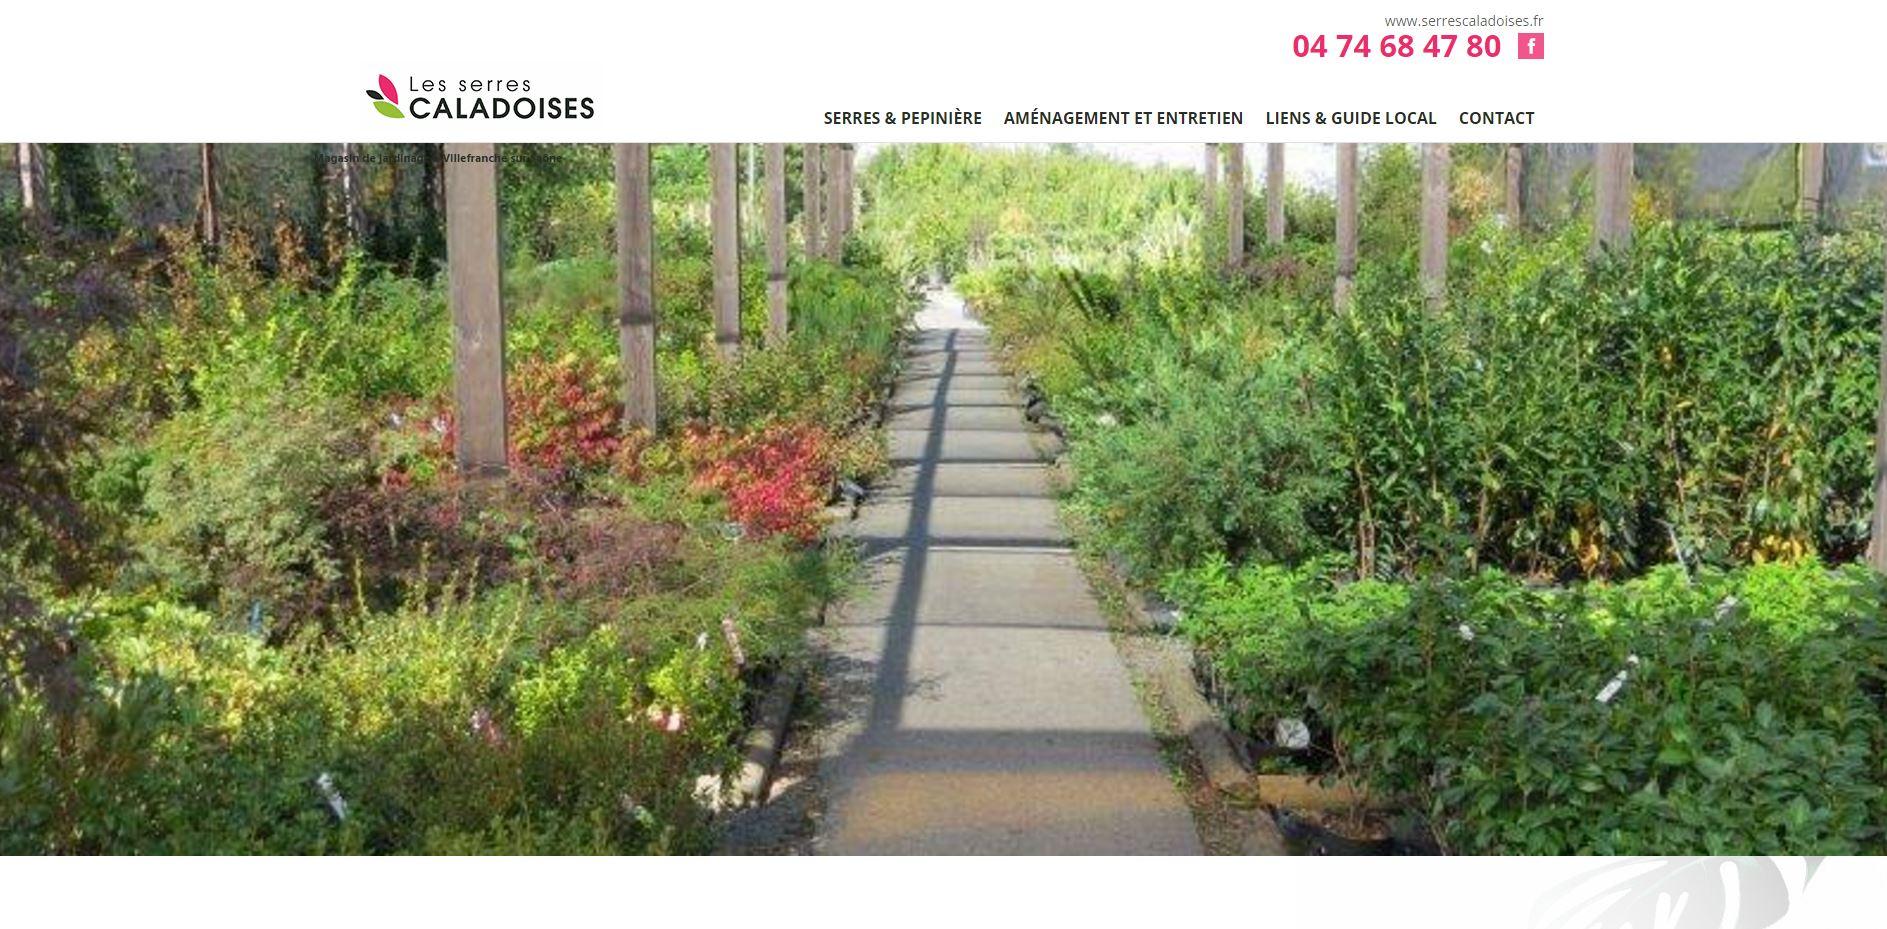 Site de vente pas chere maison design for Alarme piscine pas chere